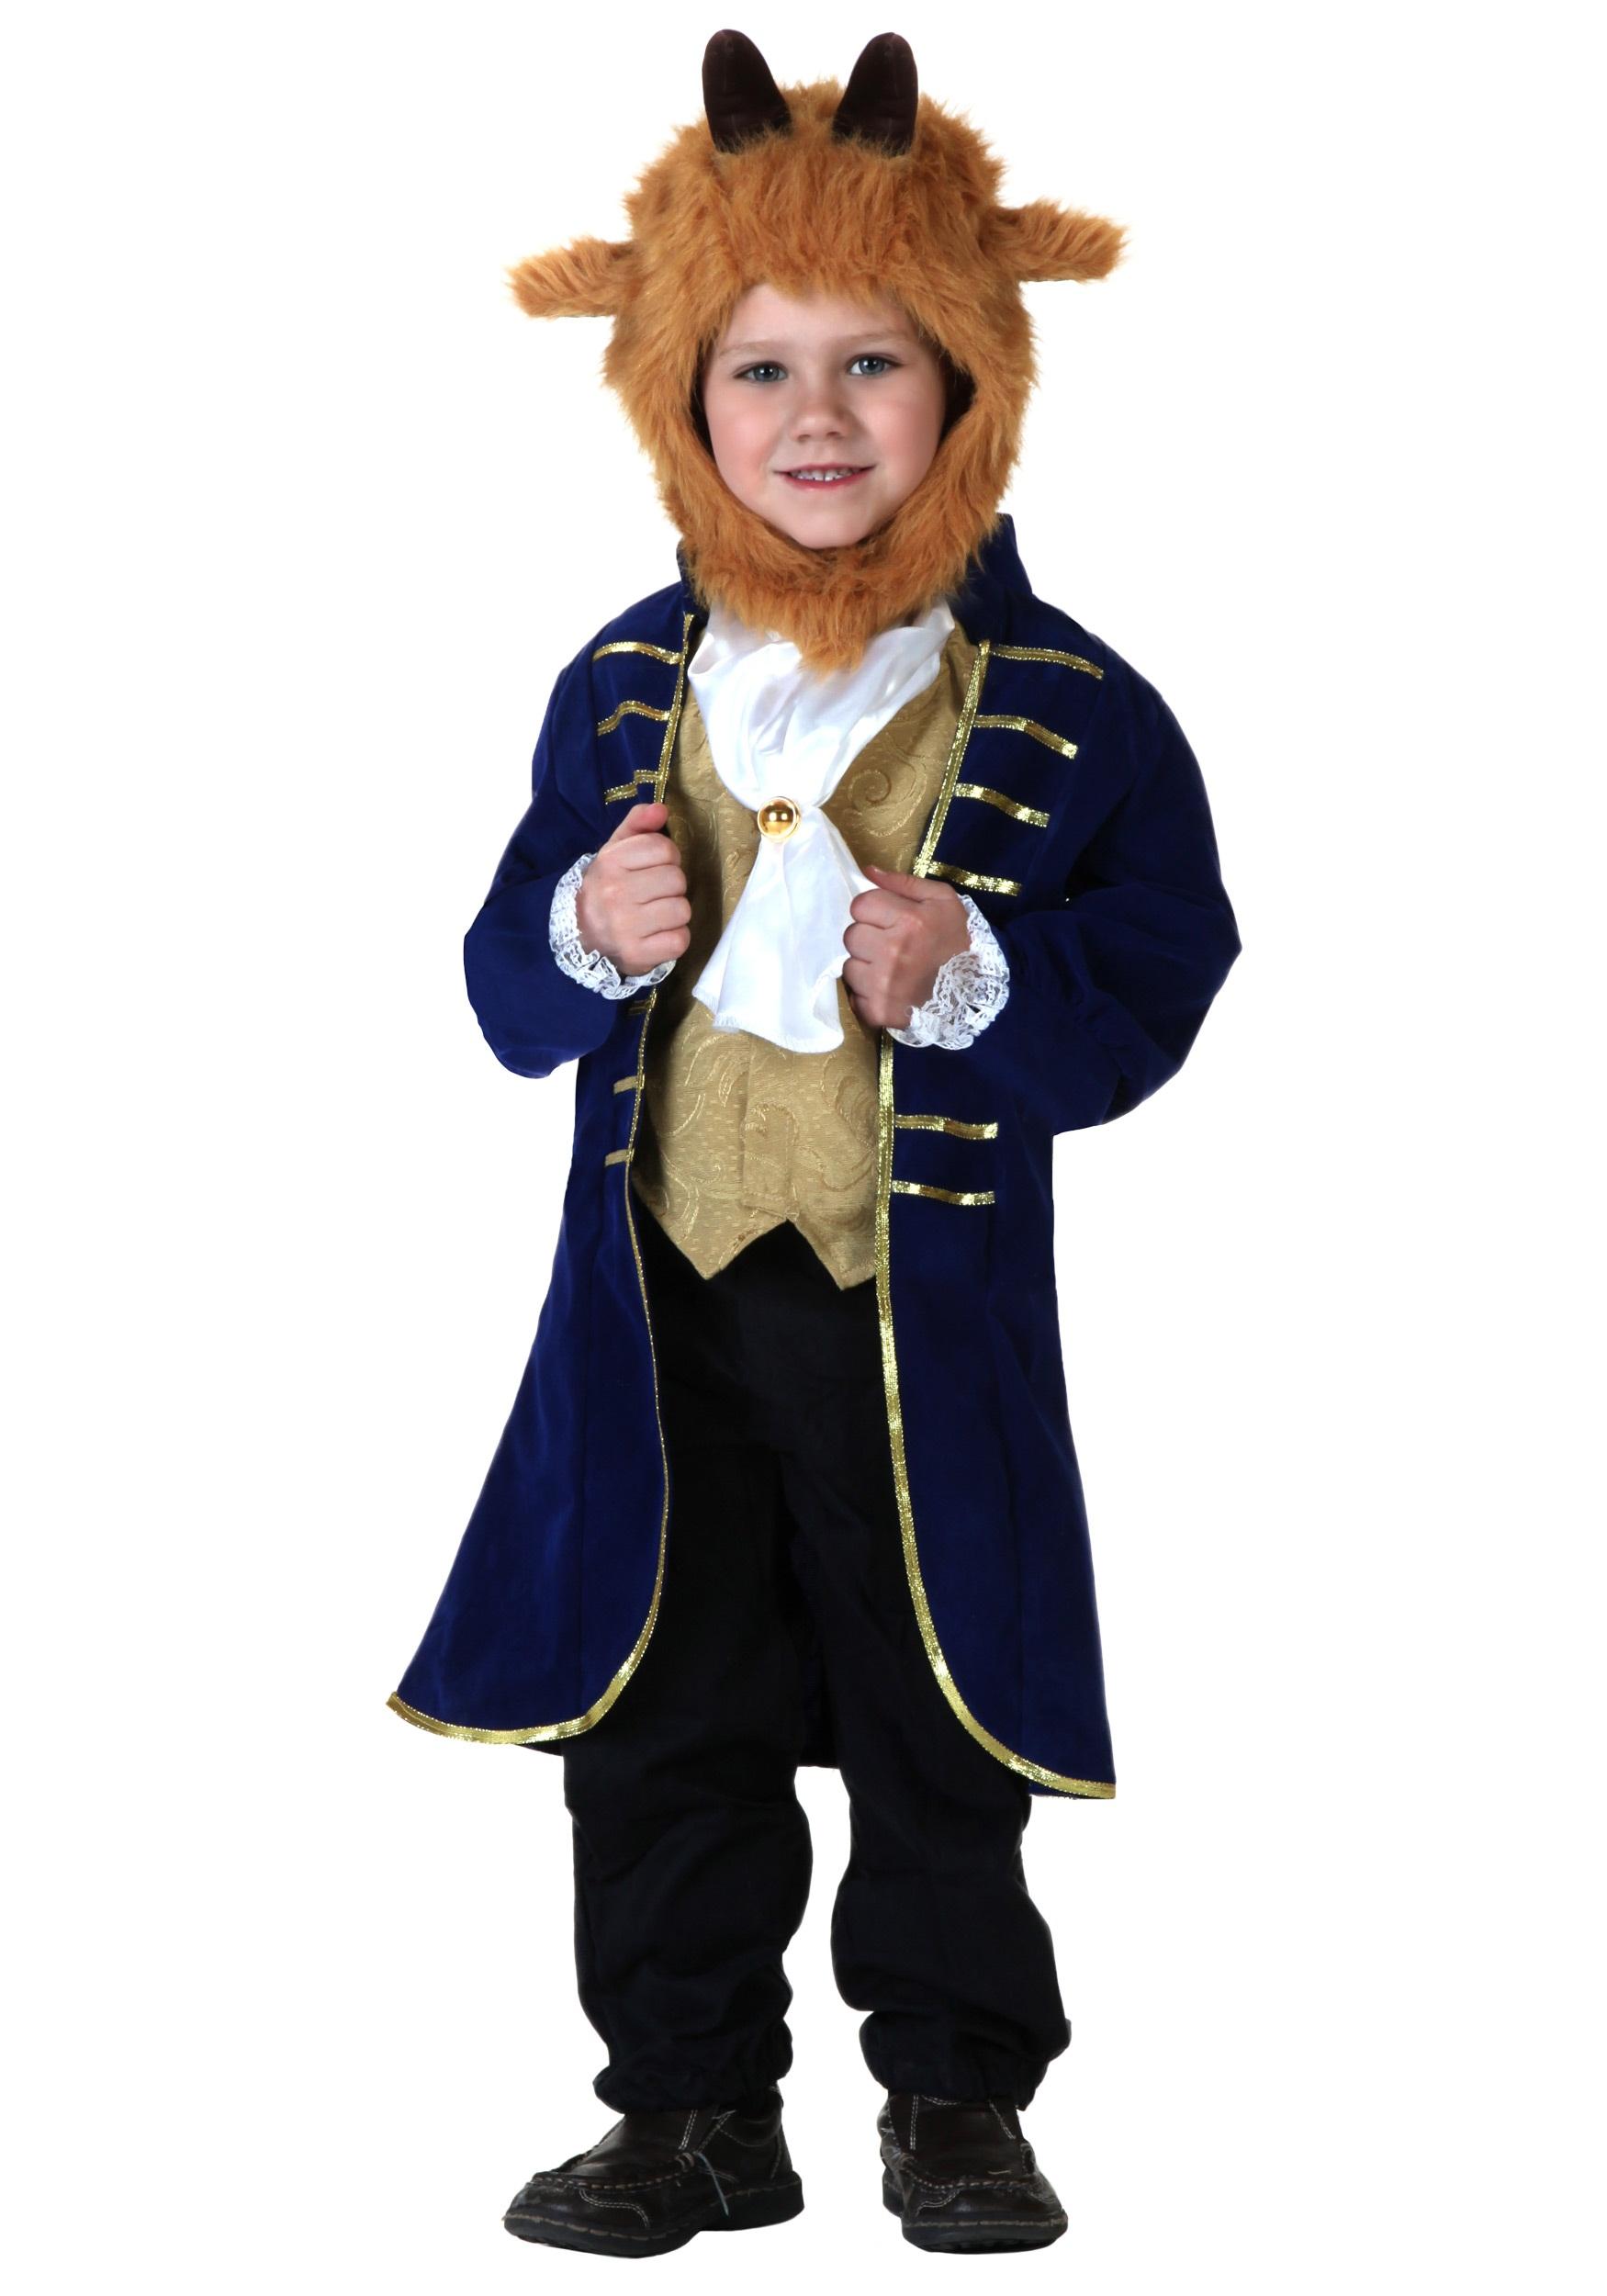 Toddler Beast Costume  sc 1 st  Halloween Costumes & Toddler Beast Costume - Halloween Costumes